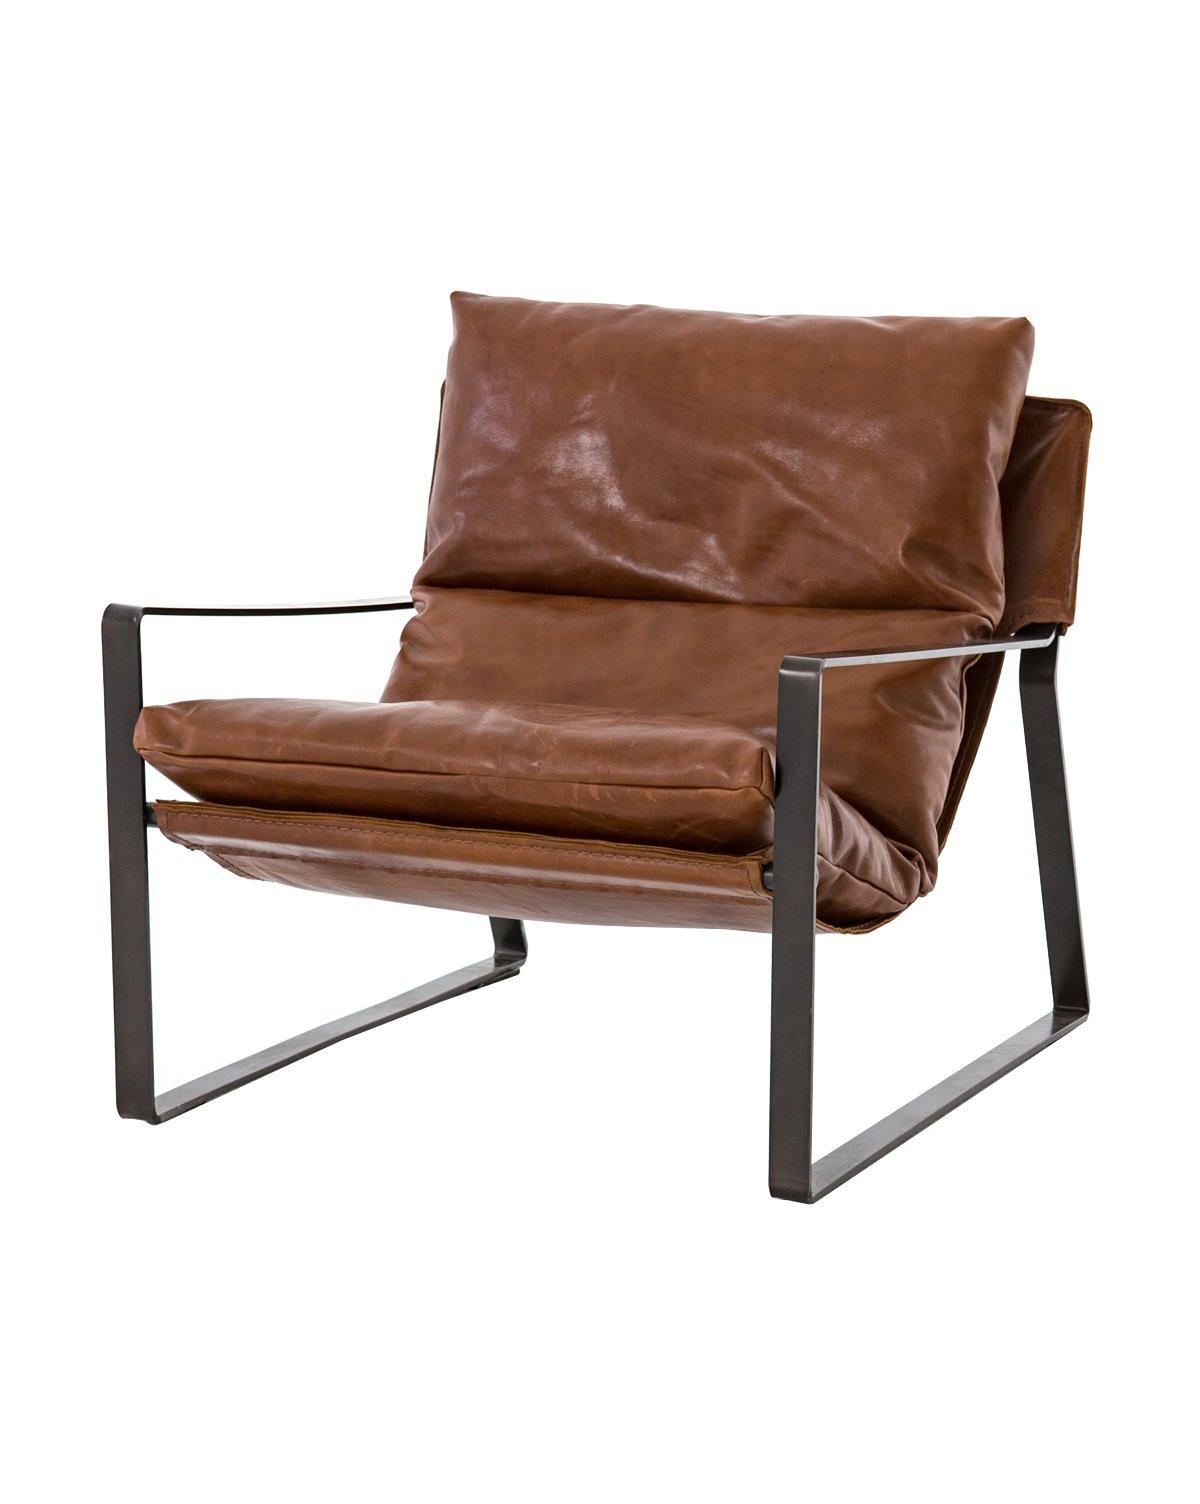 Peyton_Chair_Tobbaco_1_f091fcda-ac26-424b-b8b8-16faea68ac28.jpg